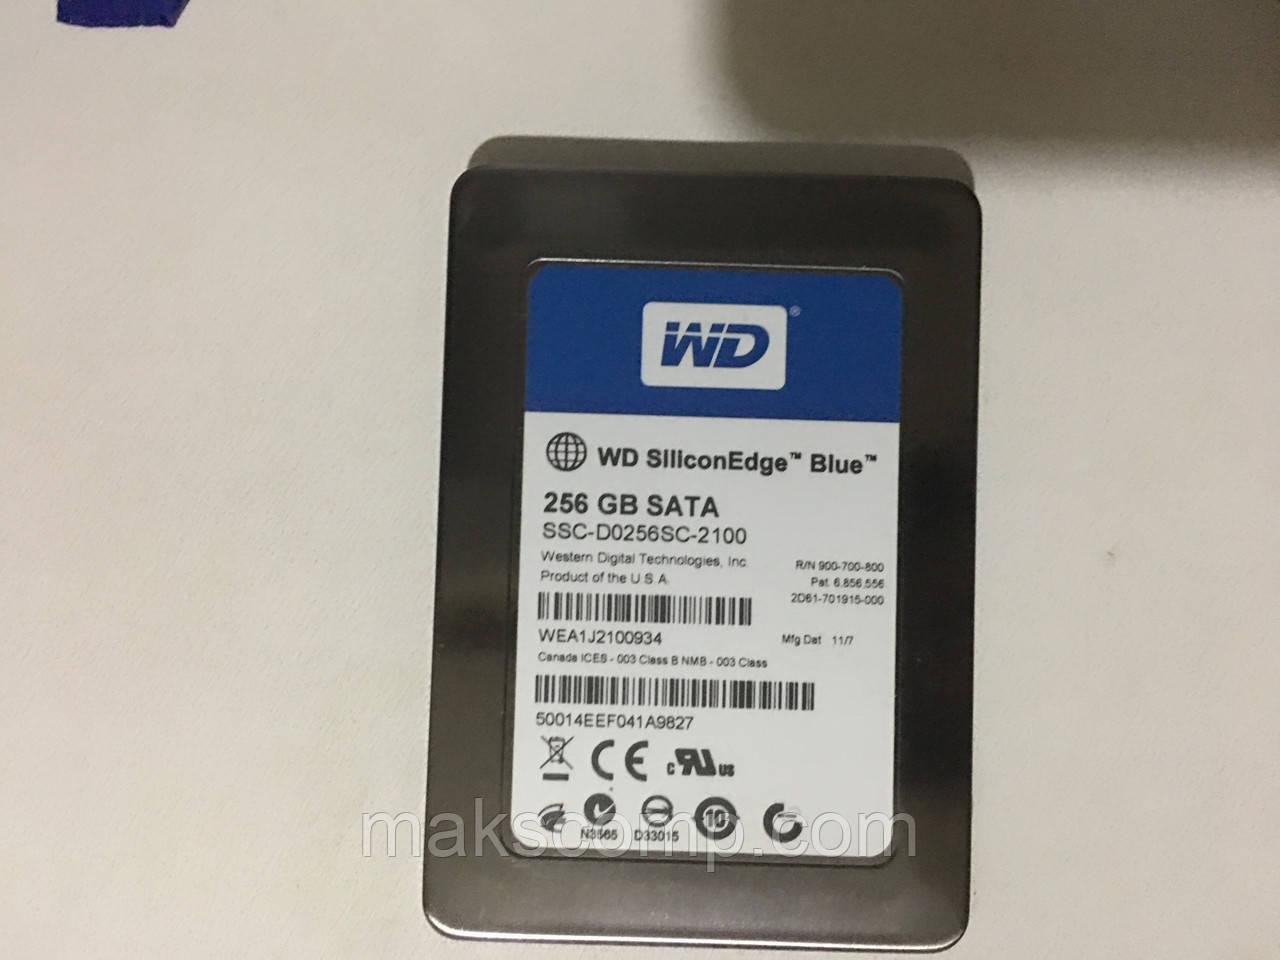 "SSD WD SiliconEdge 256GB 2.5"" SATAII MLC (SSC-D0256SC-2100)"